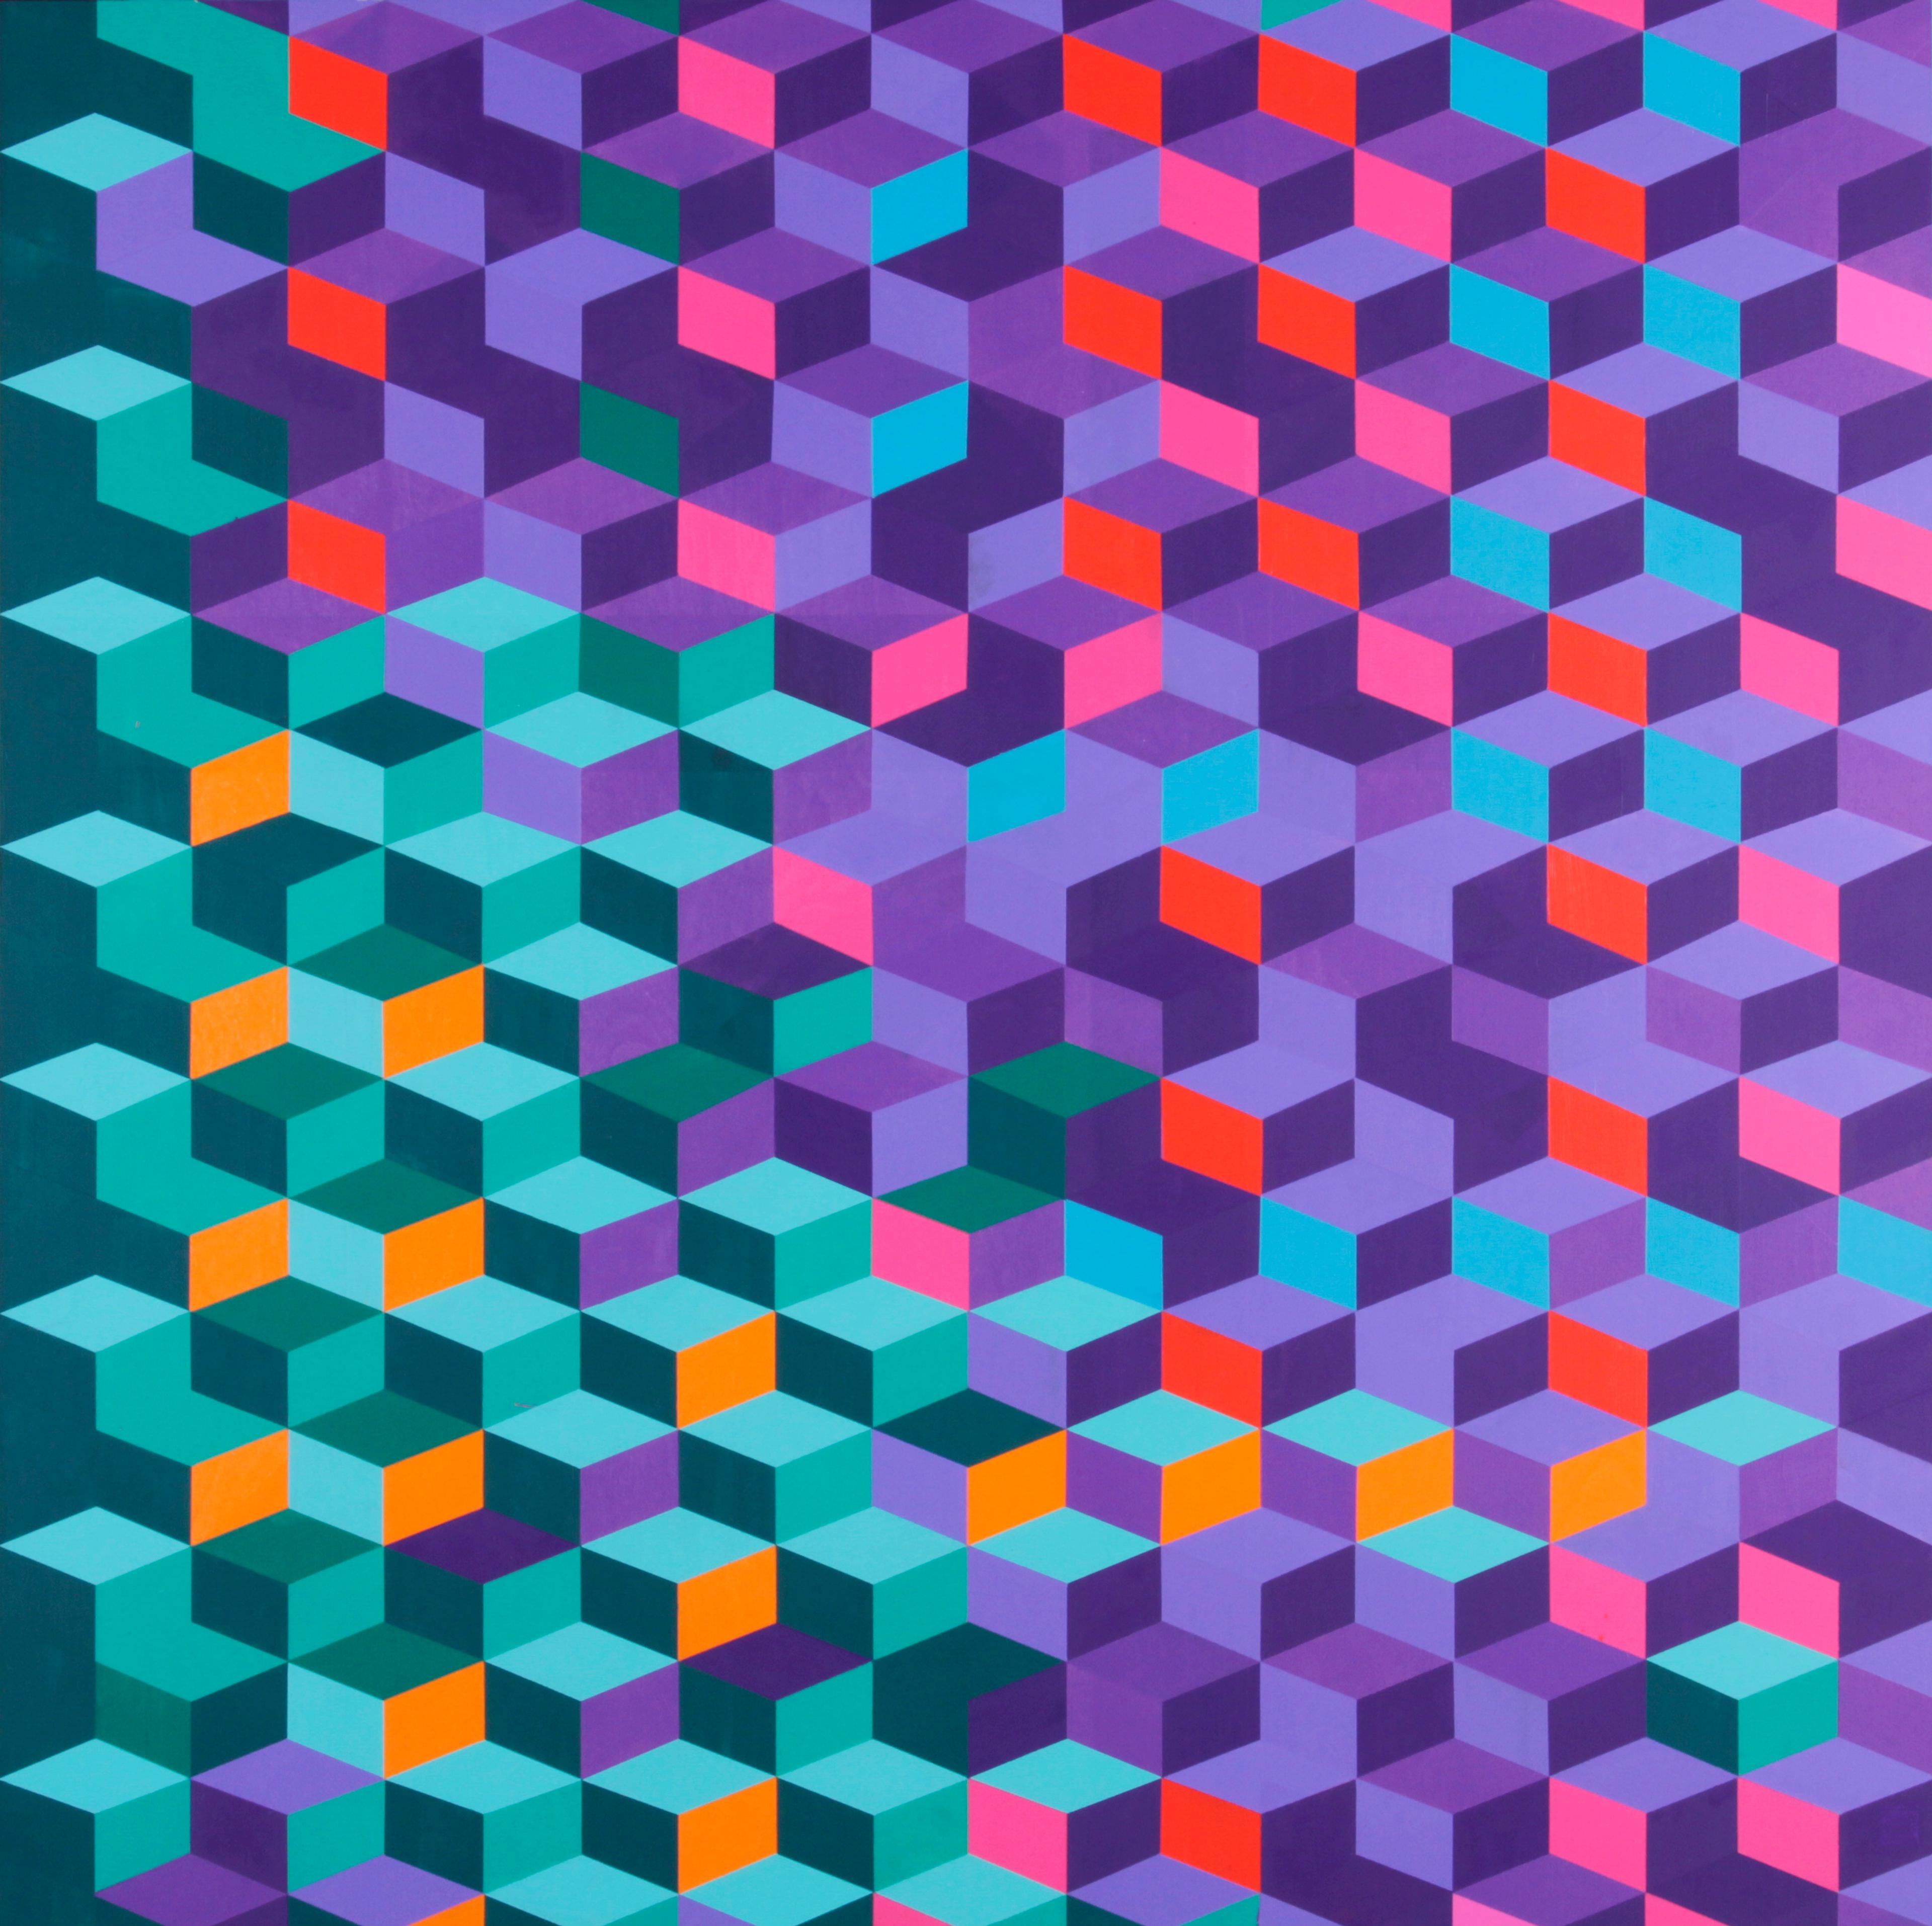 artwork SJIYH-Windows-I by Darko C. Nikolic